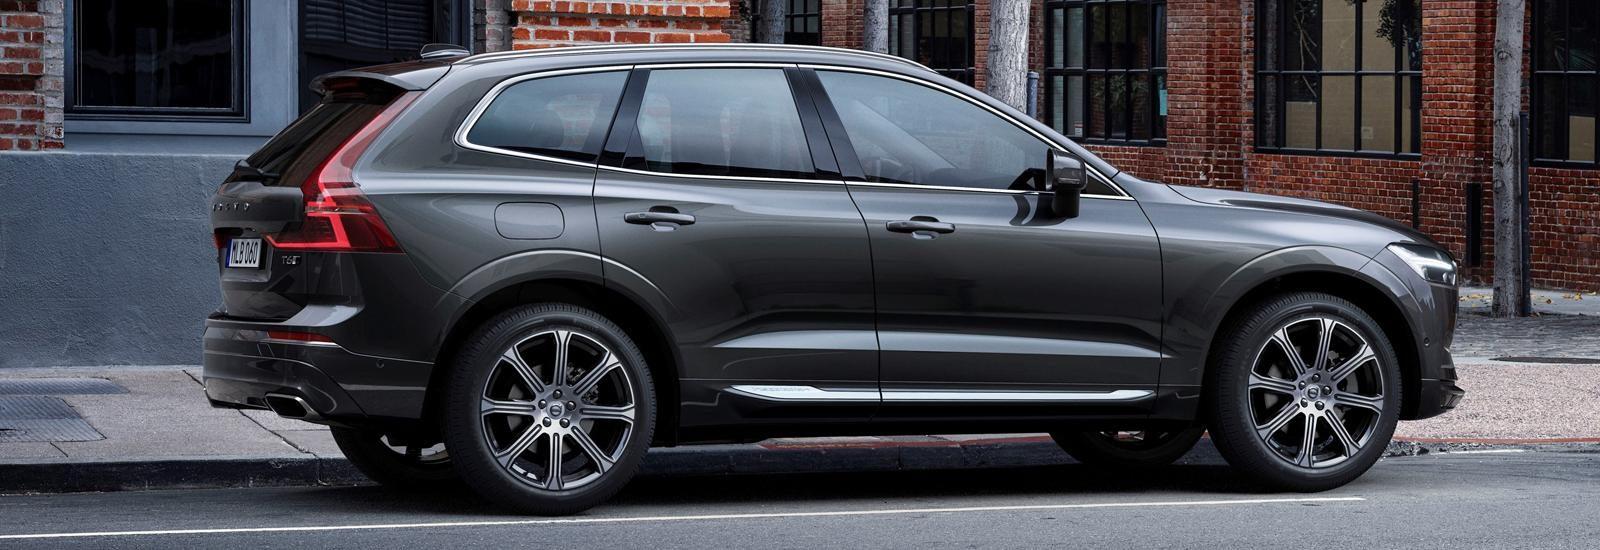 Volvo-XC60-Driving_0